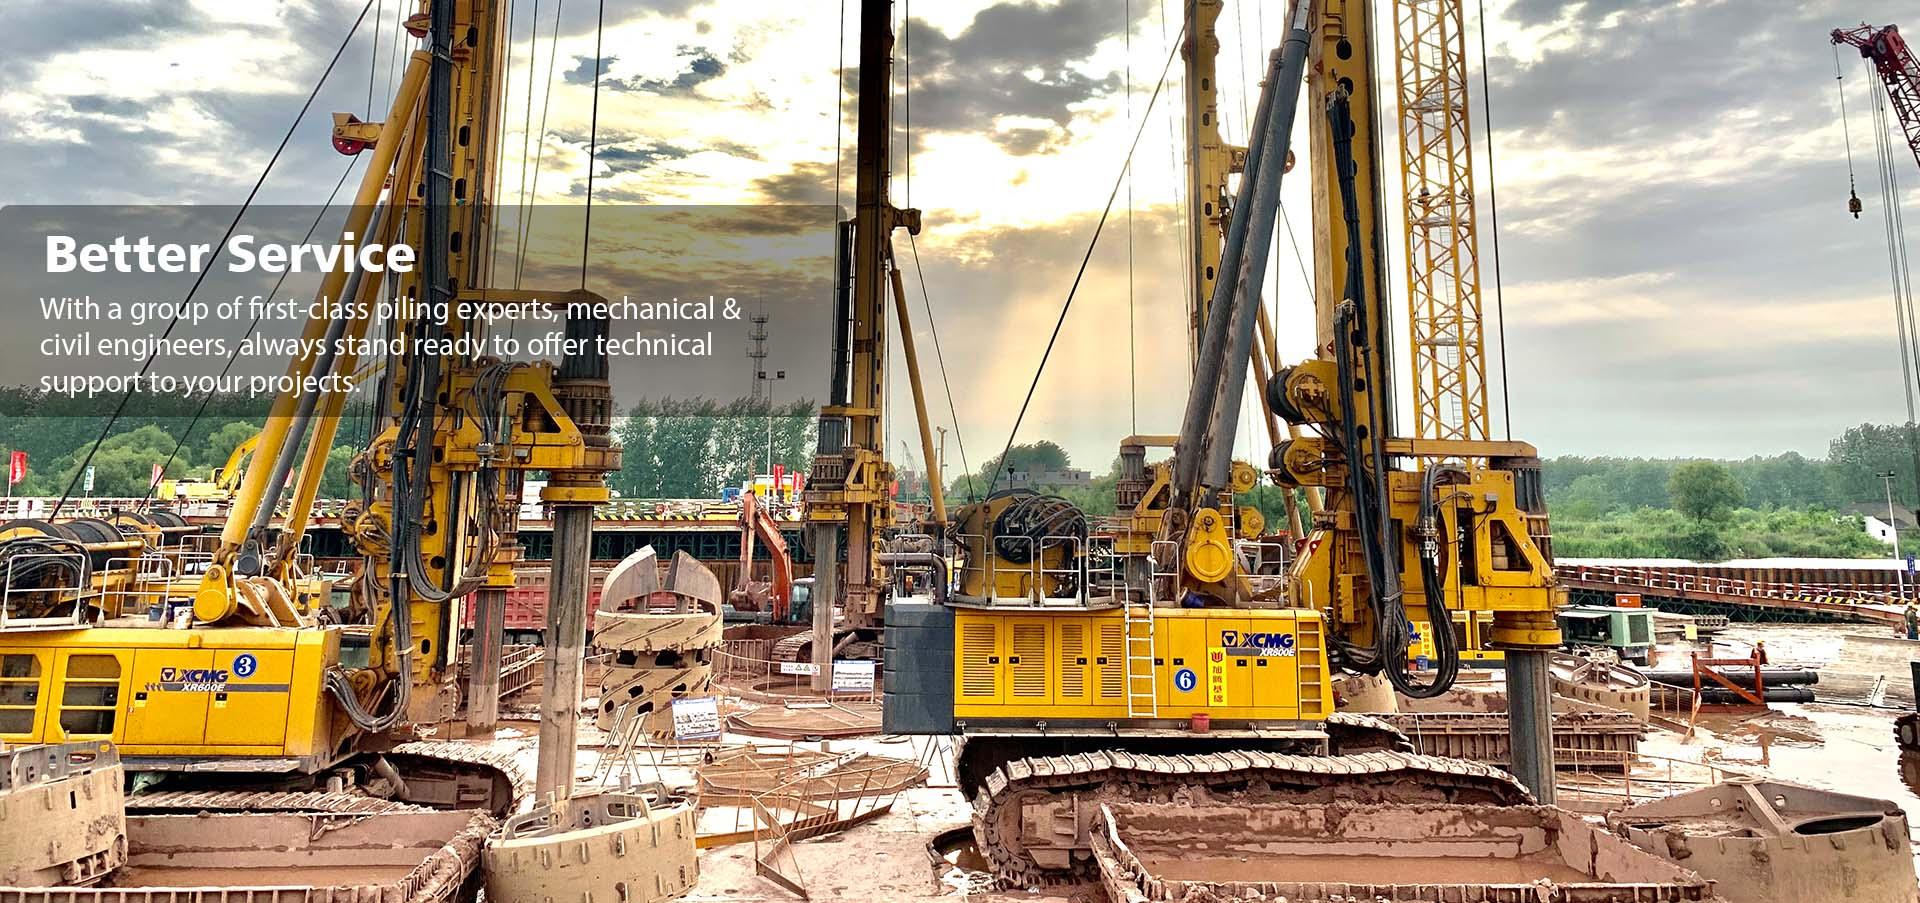 kelly bar construction site